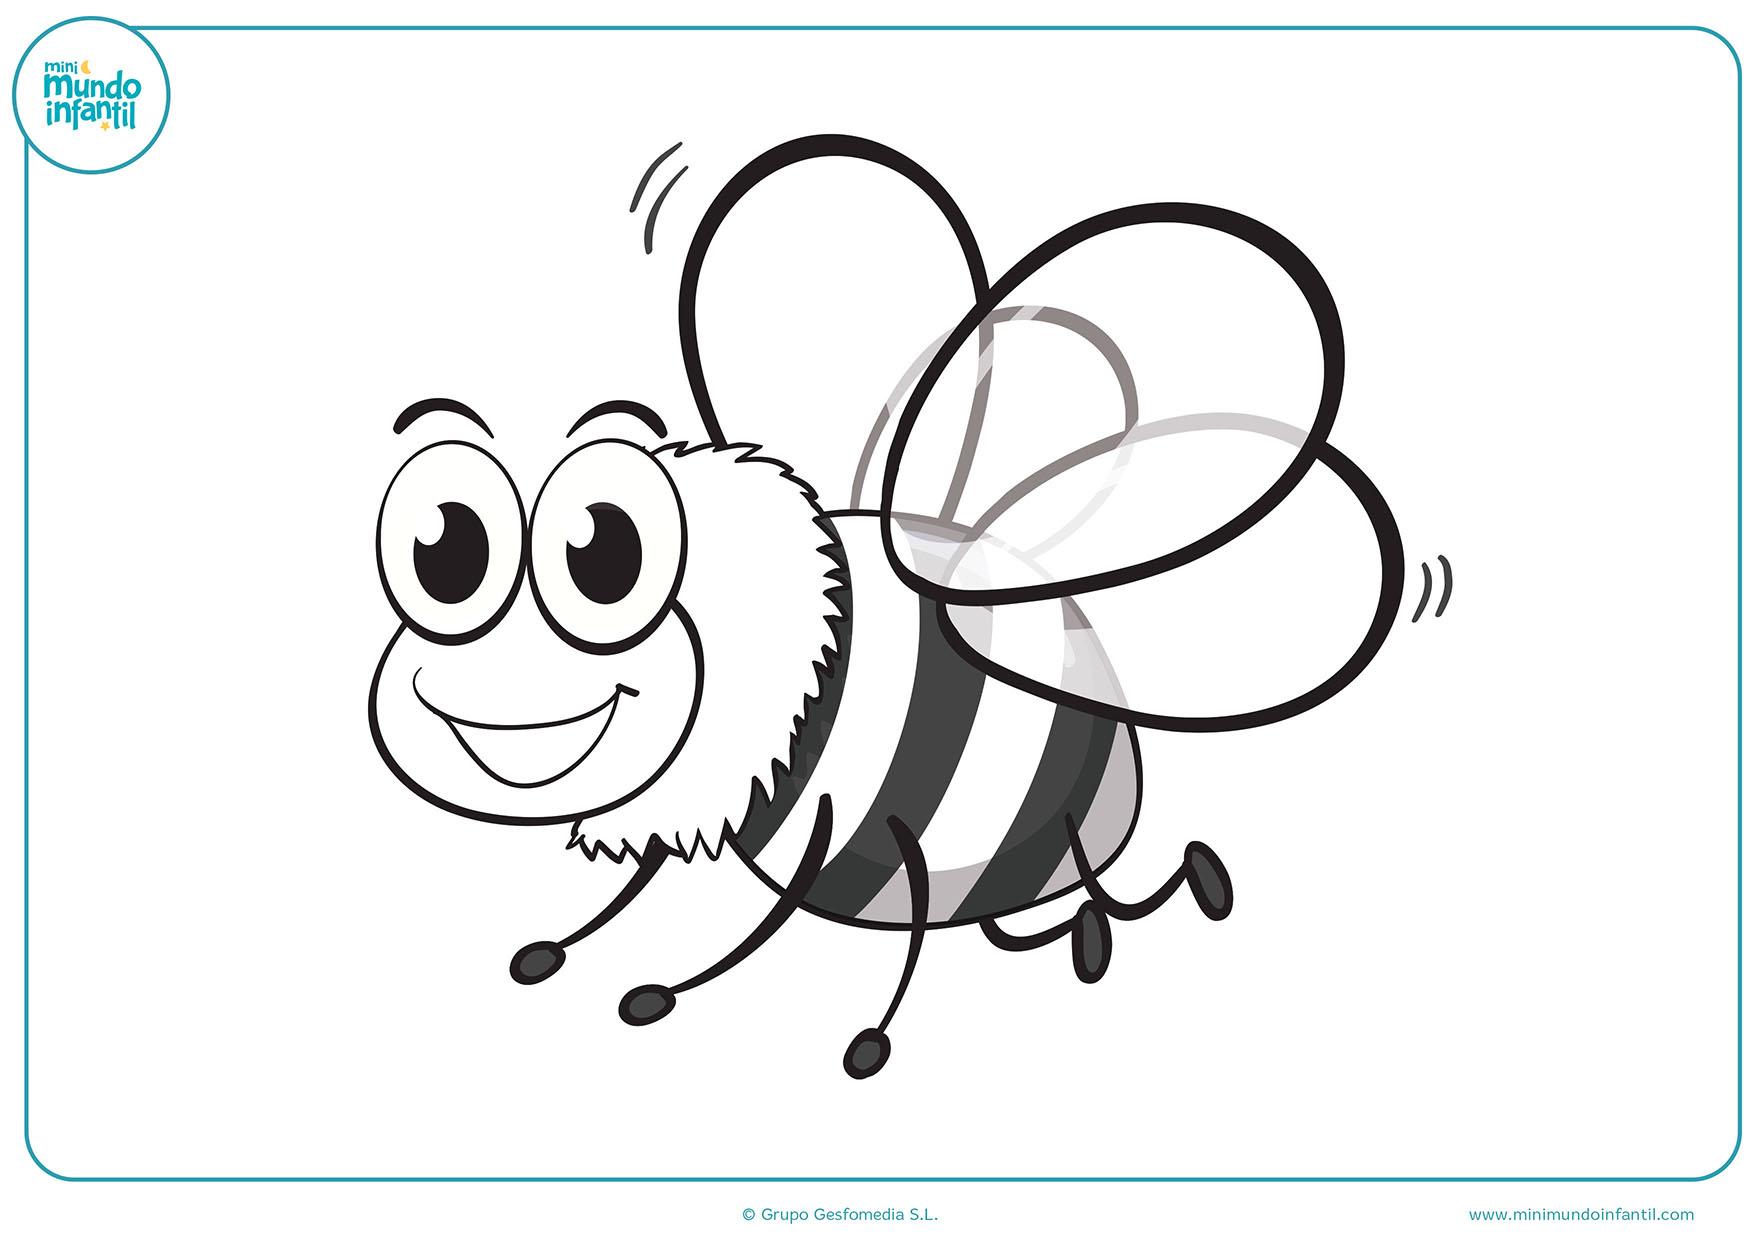 Dibujos Para Colorear E Imprimir De Hormigas ~ Ideas Creativas Sobre ...